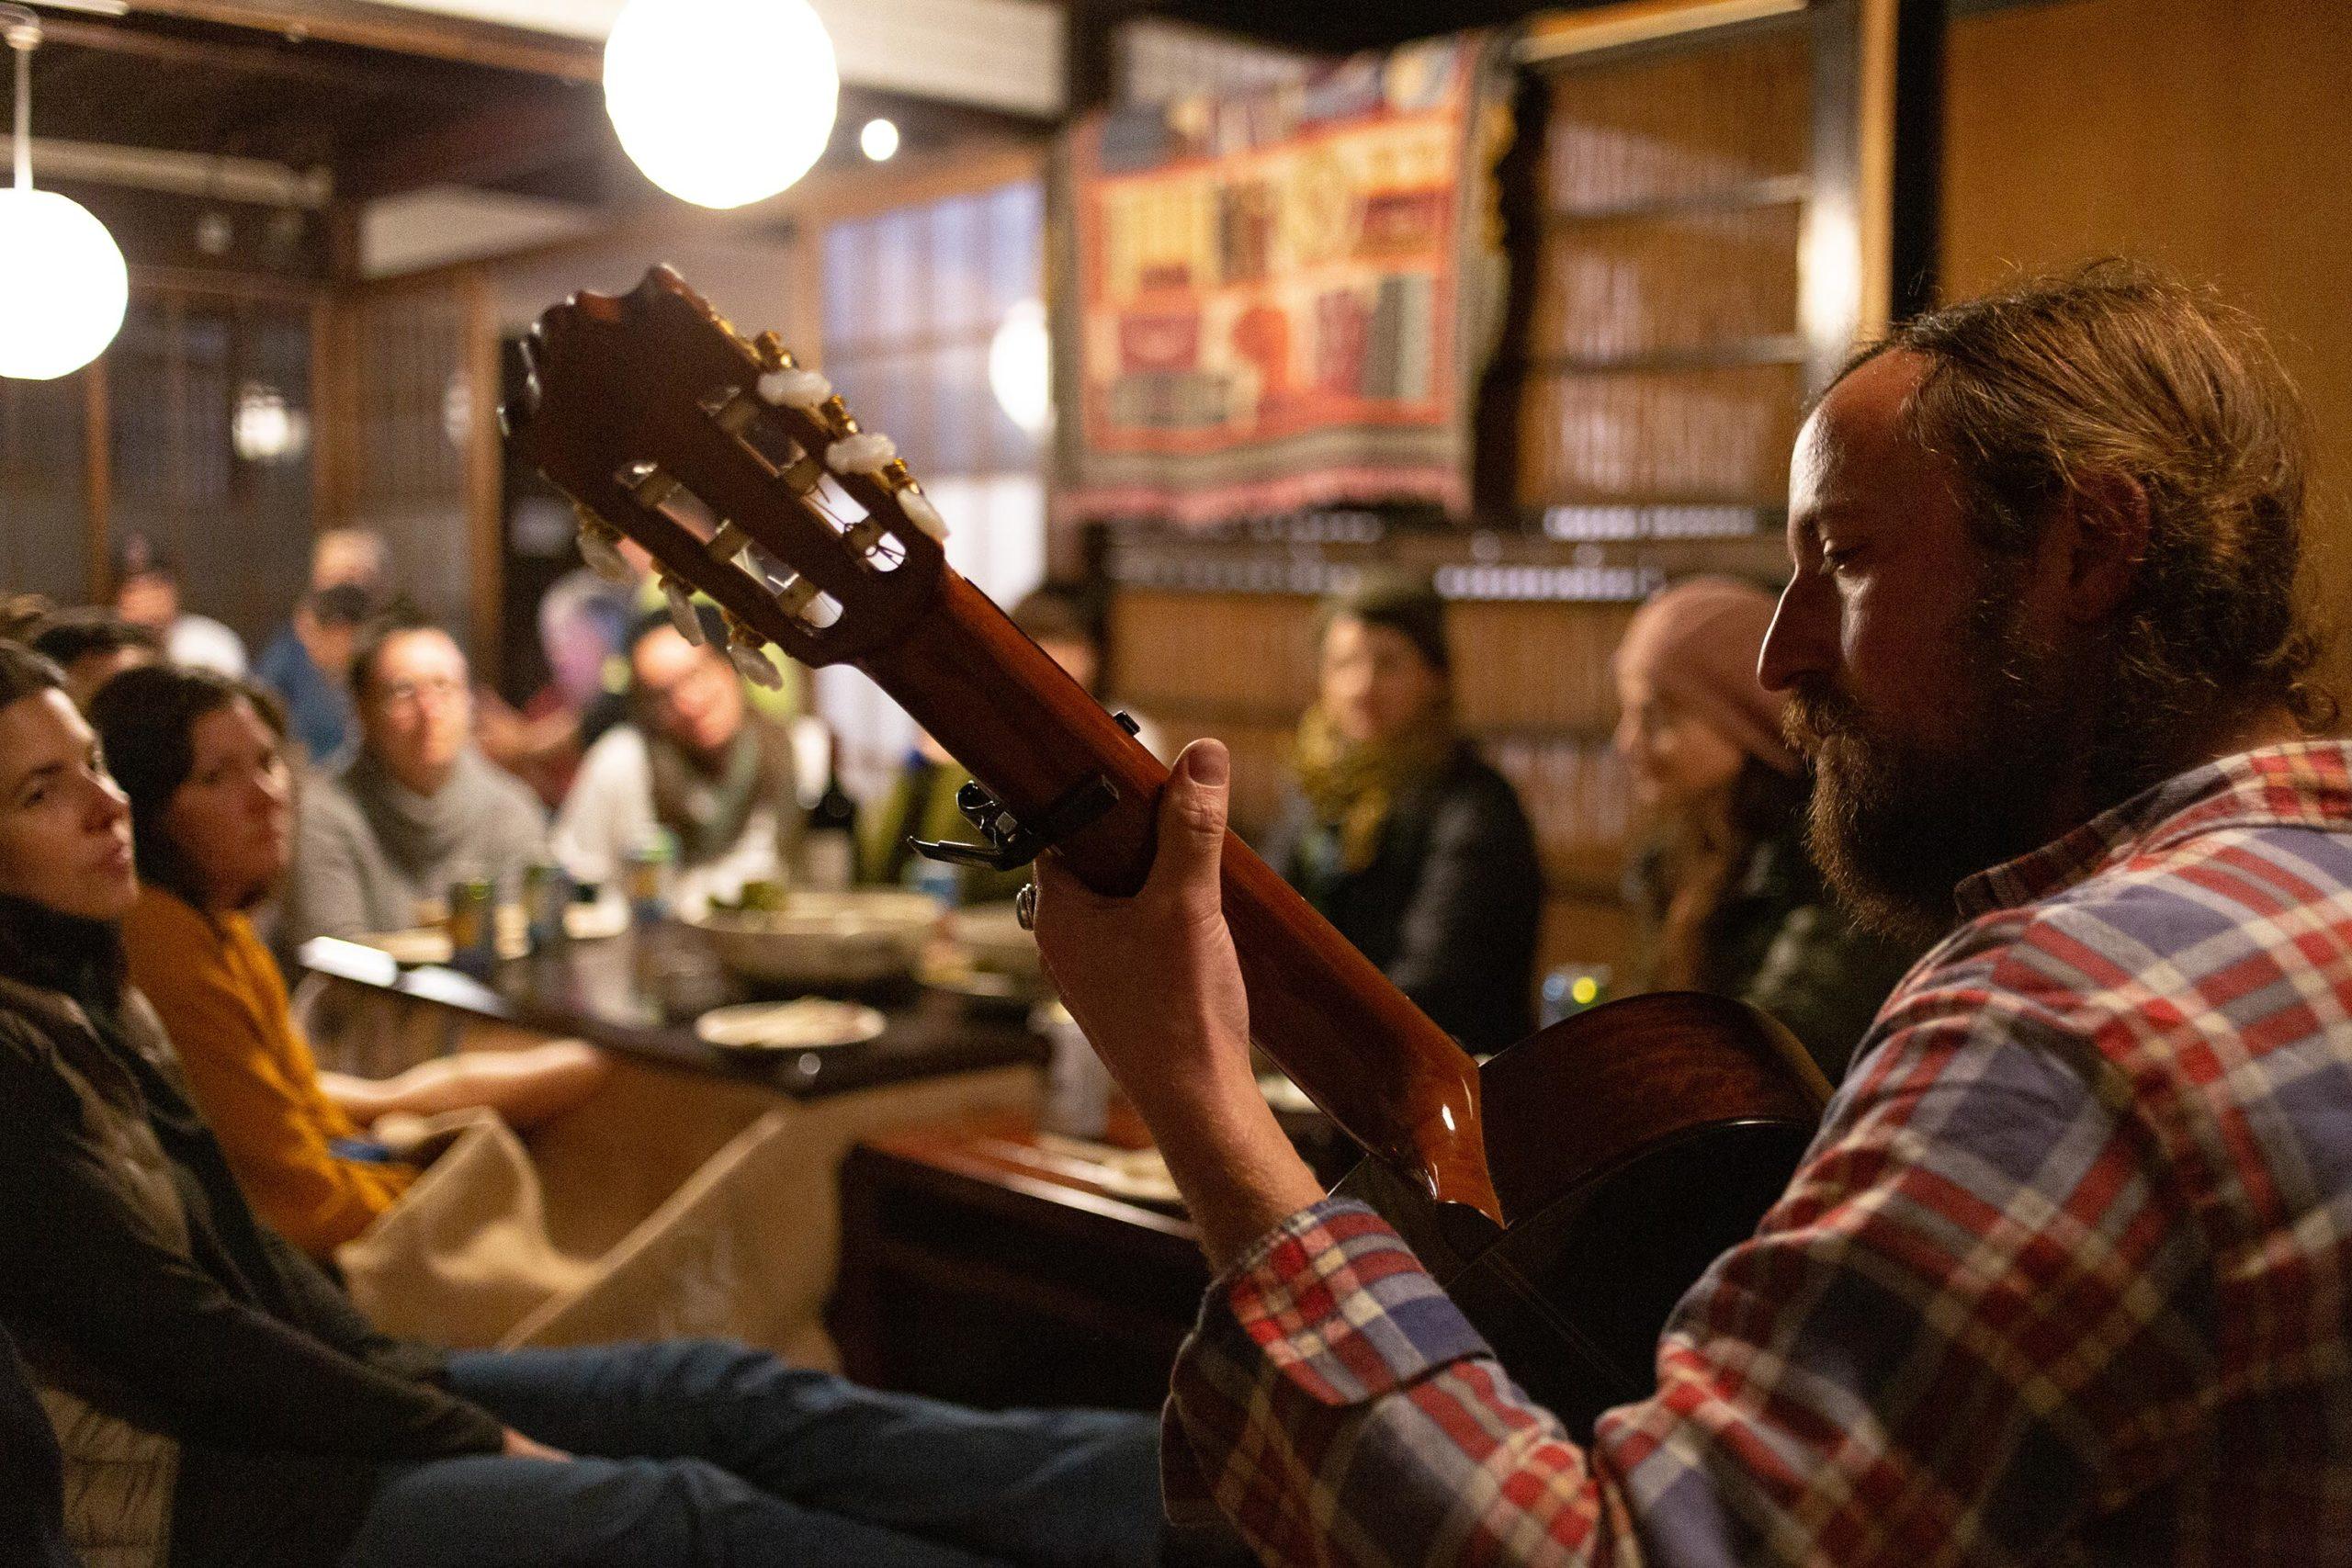 Paul DeHaven plays guitar in Onishi, Japan